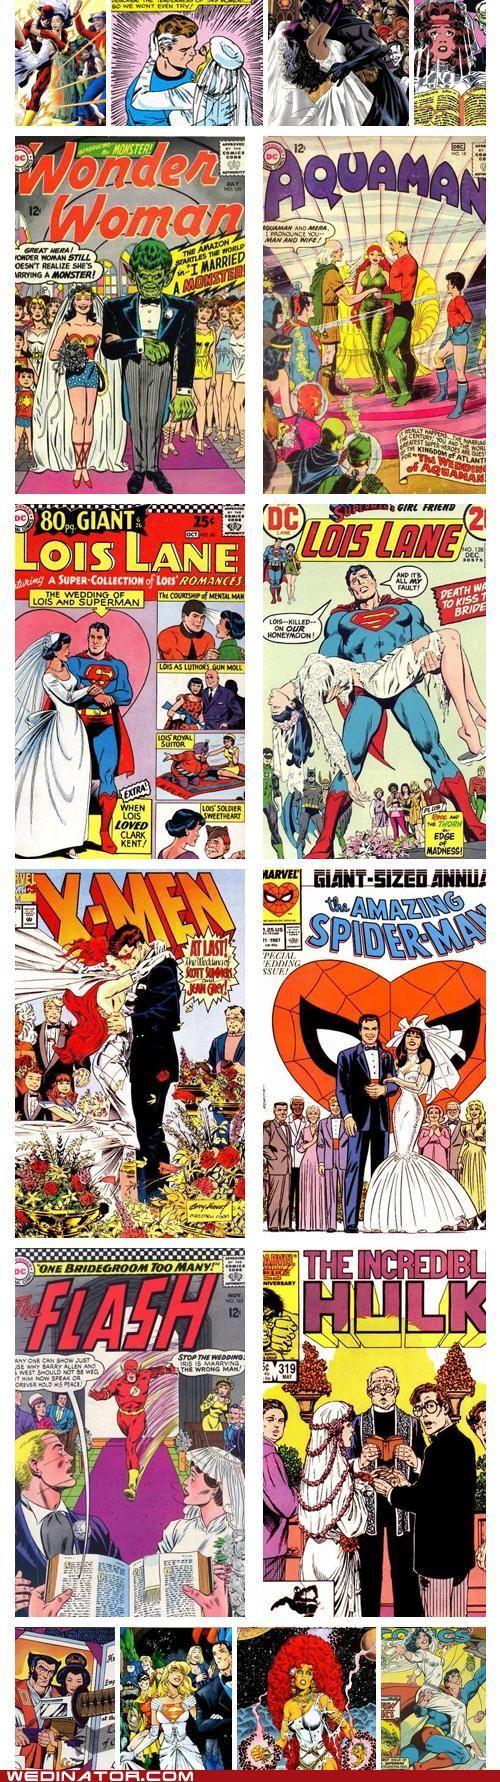 comic book weddings